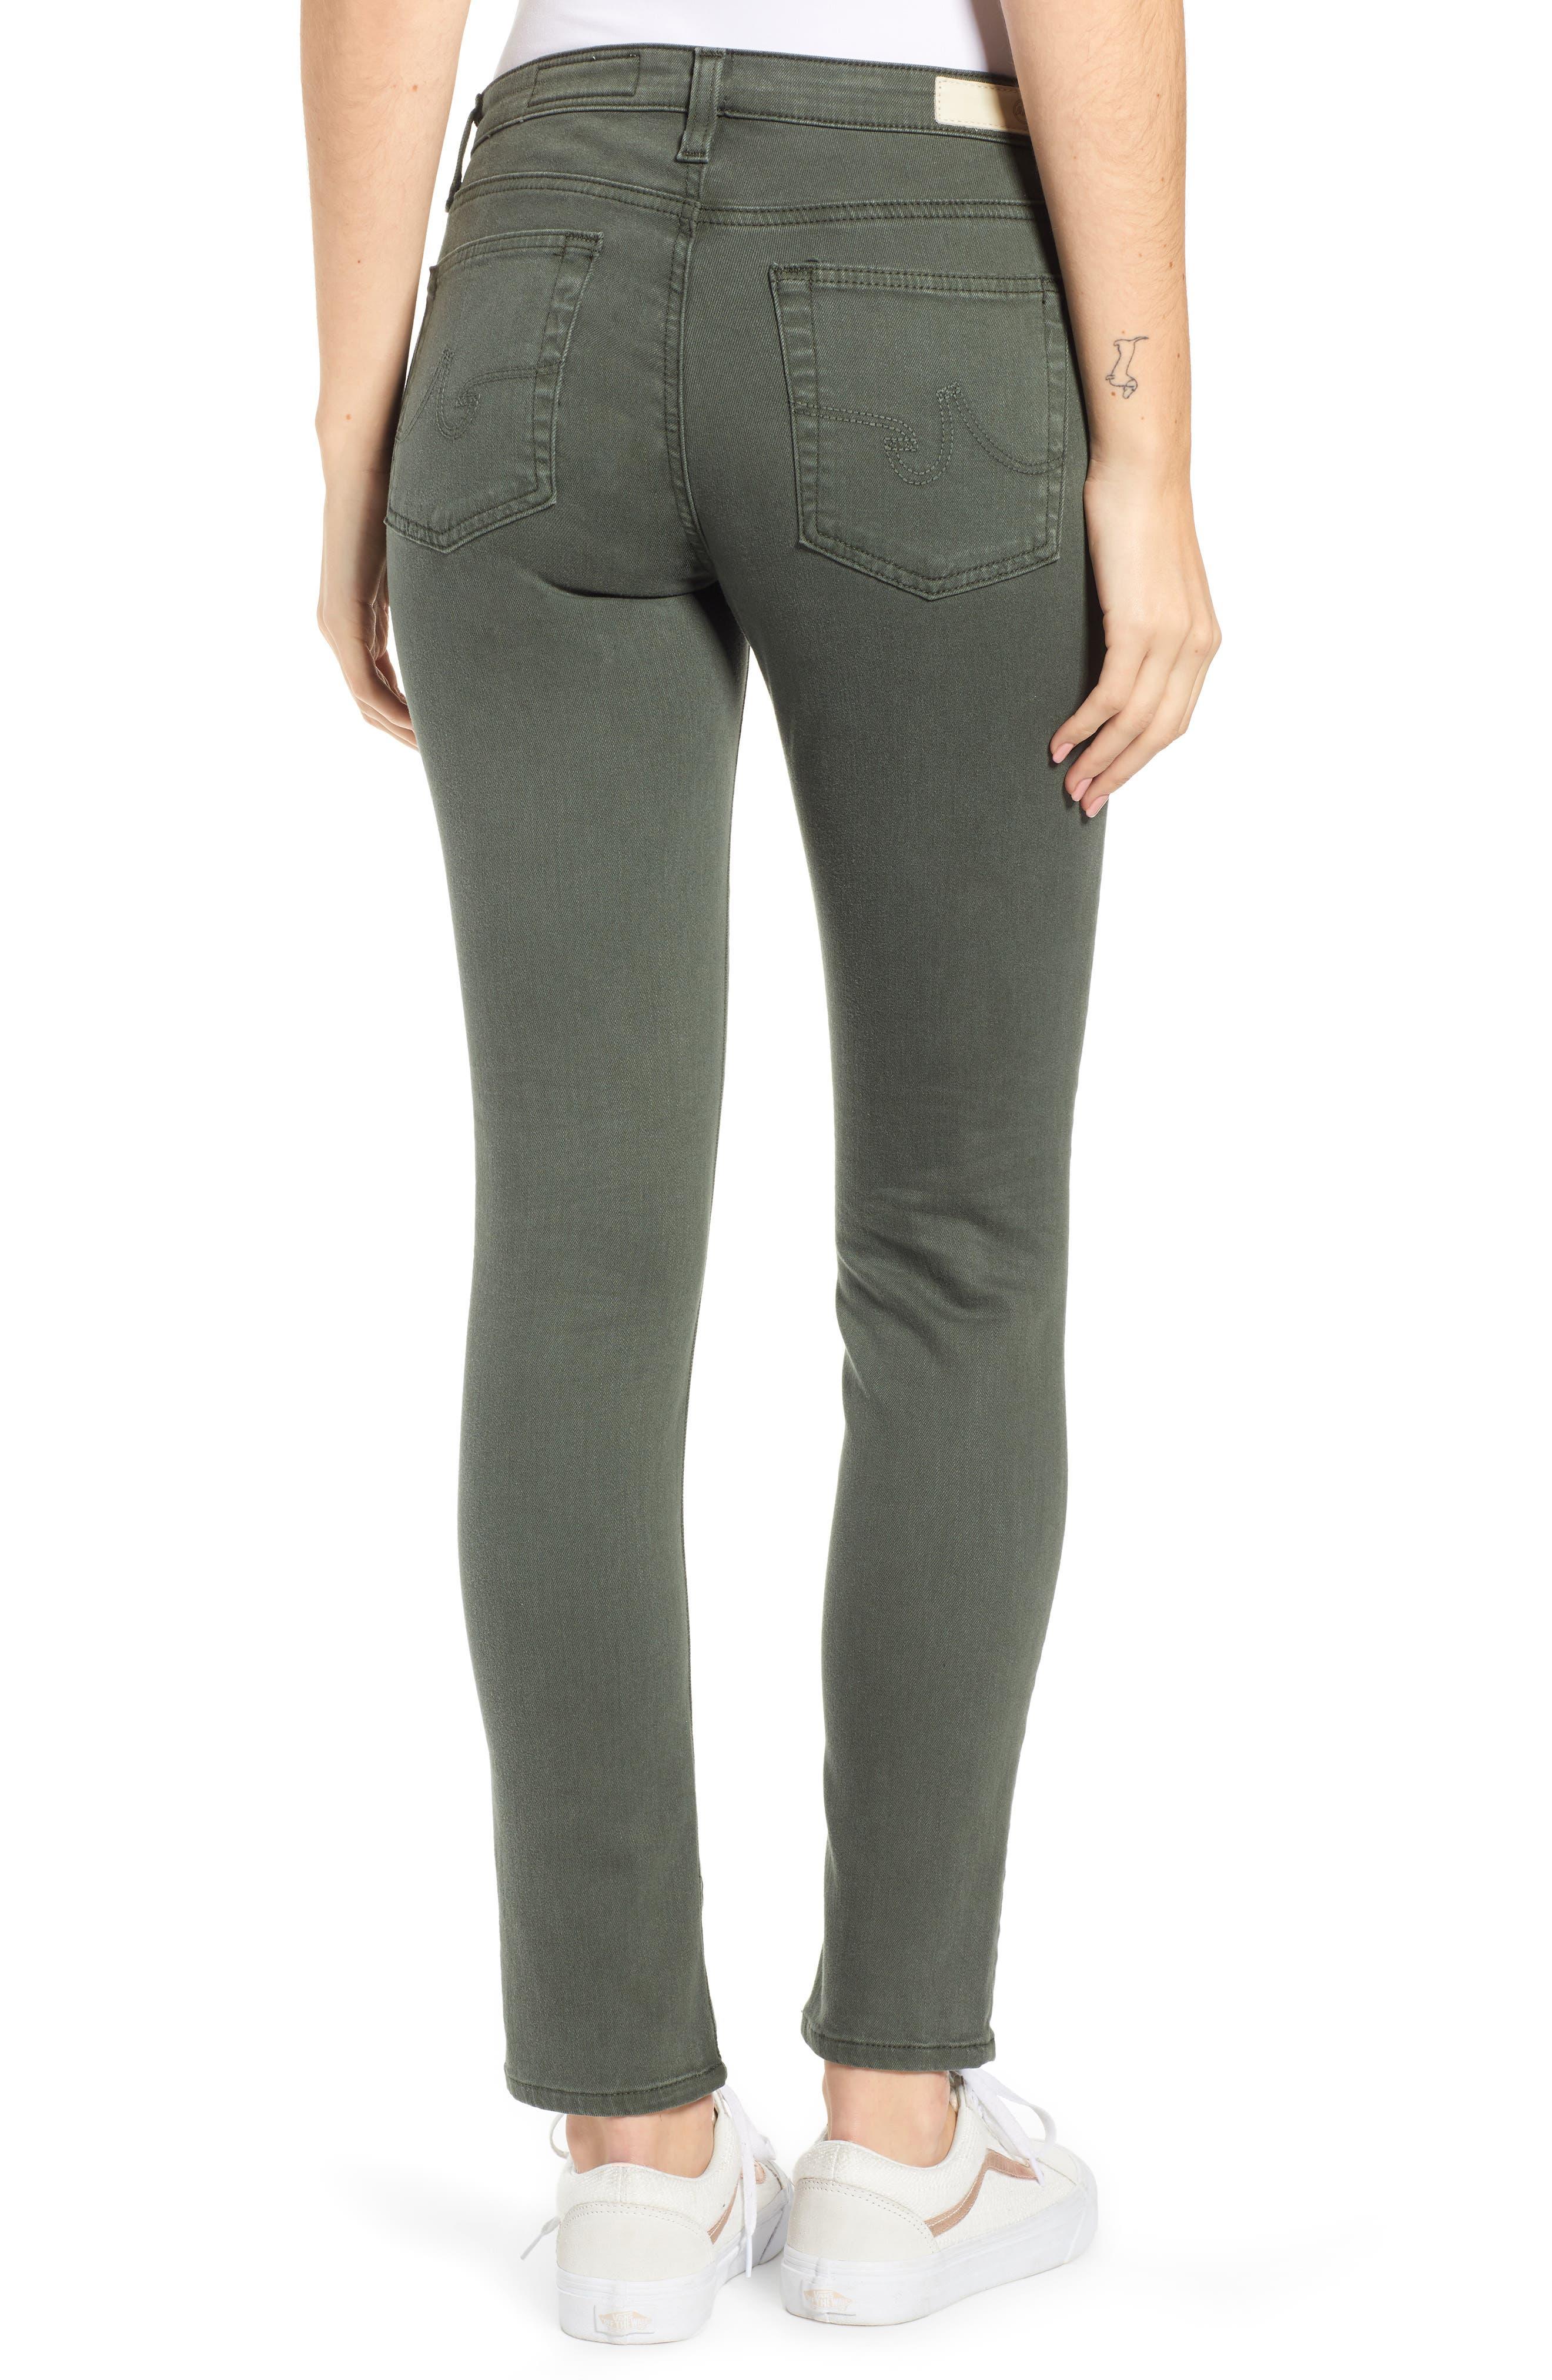 AG, The Prima Ankle Cigarette Jeans, Alternate thumbnail 2, color, 01Y SULFUR ASH GREEN